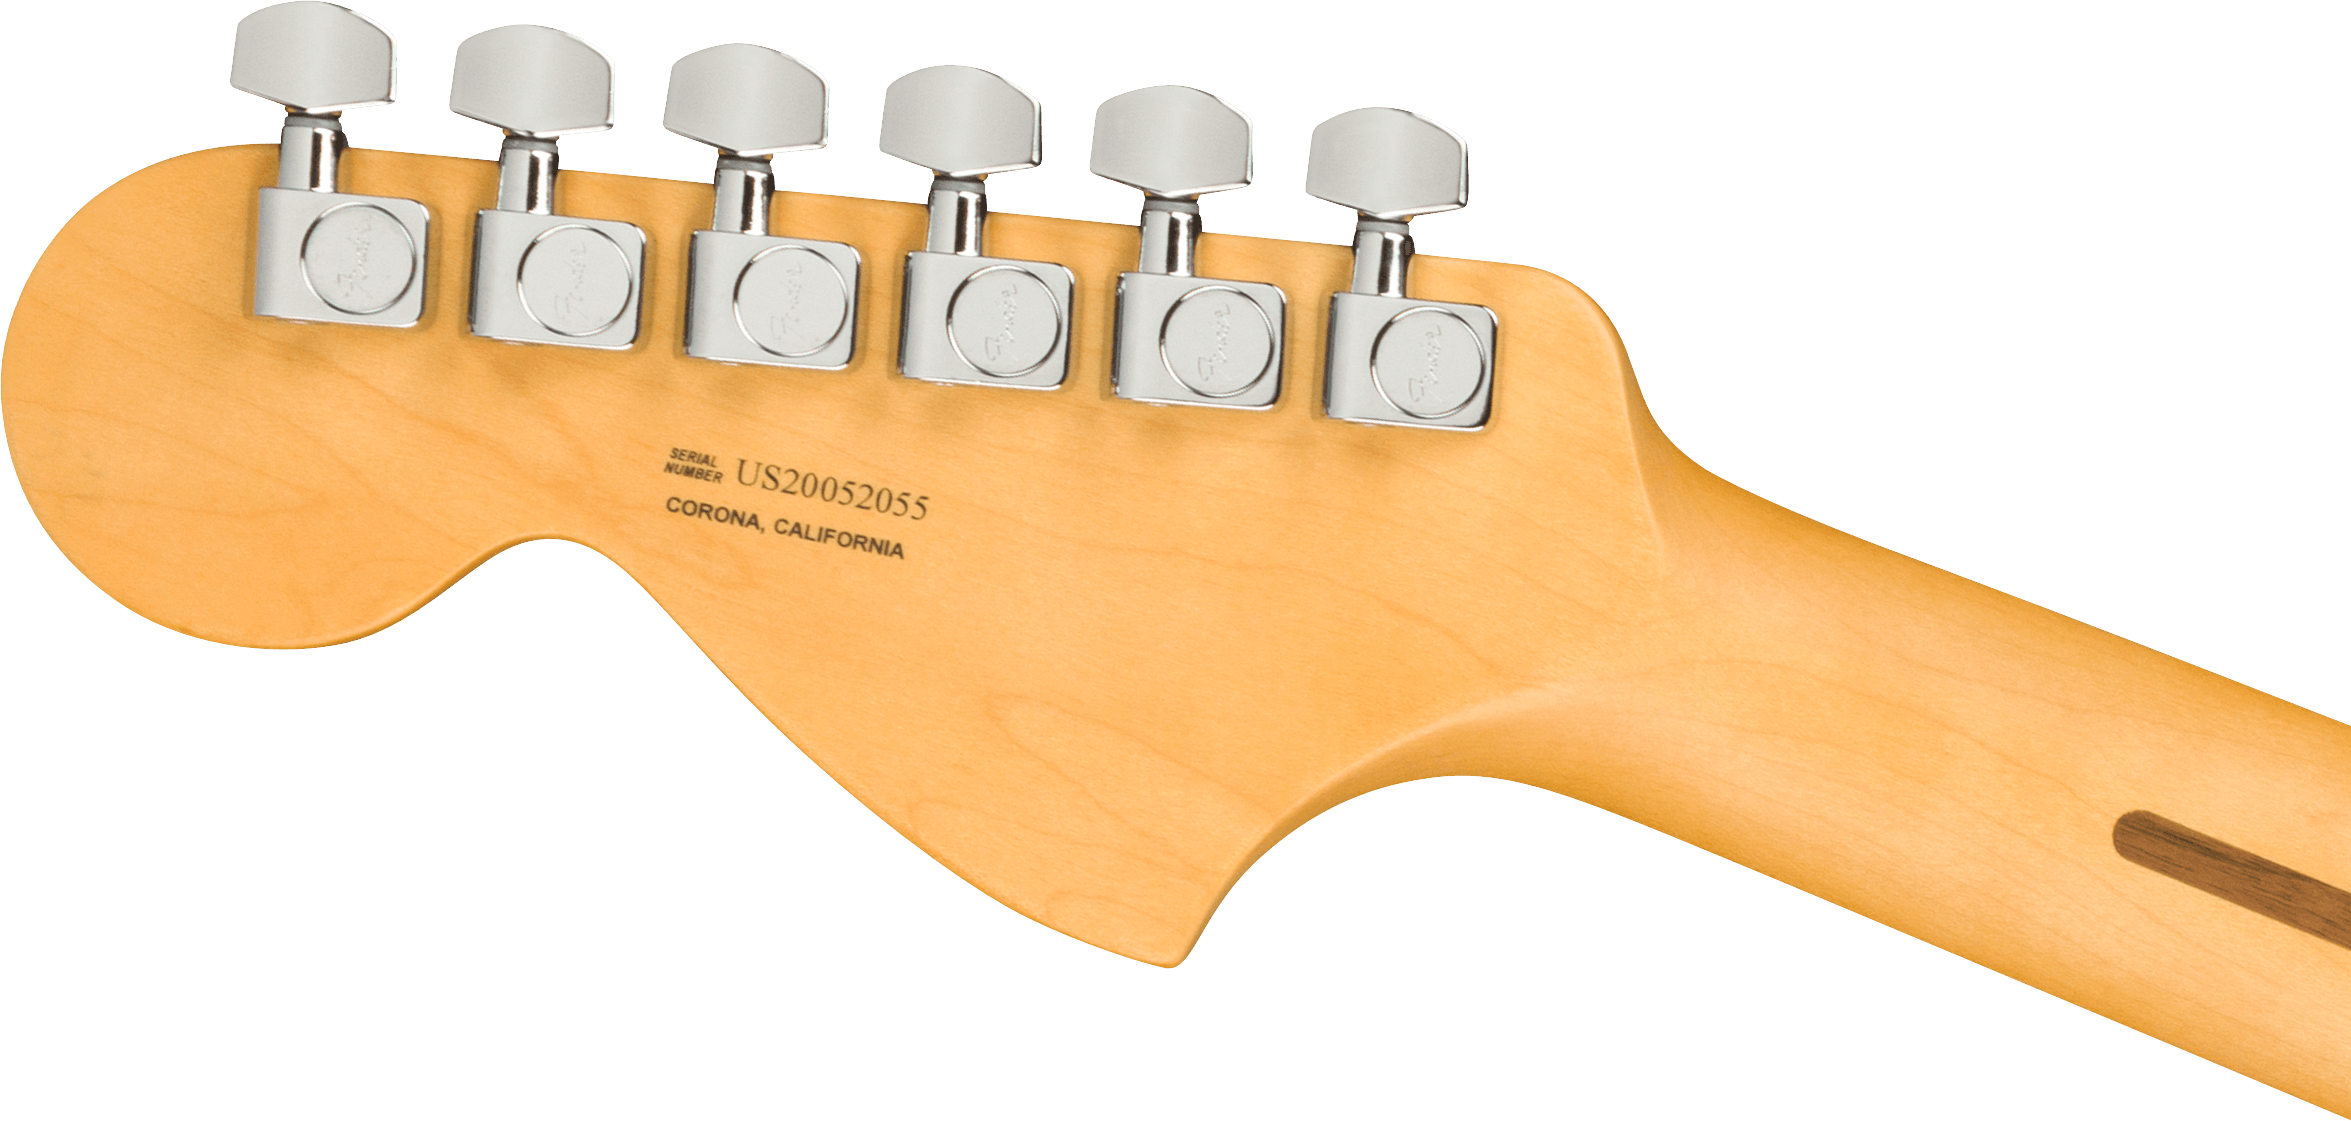 Fender American Professional II Telecaster® Deluxe, Rosewood Fingerboard, 3-Color Sunburst